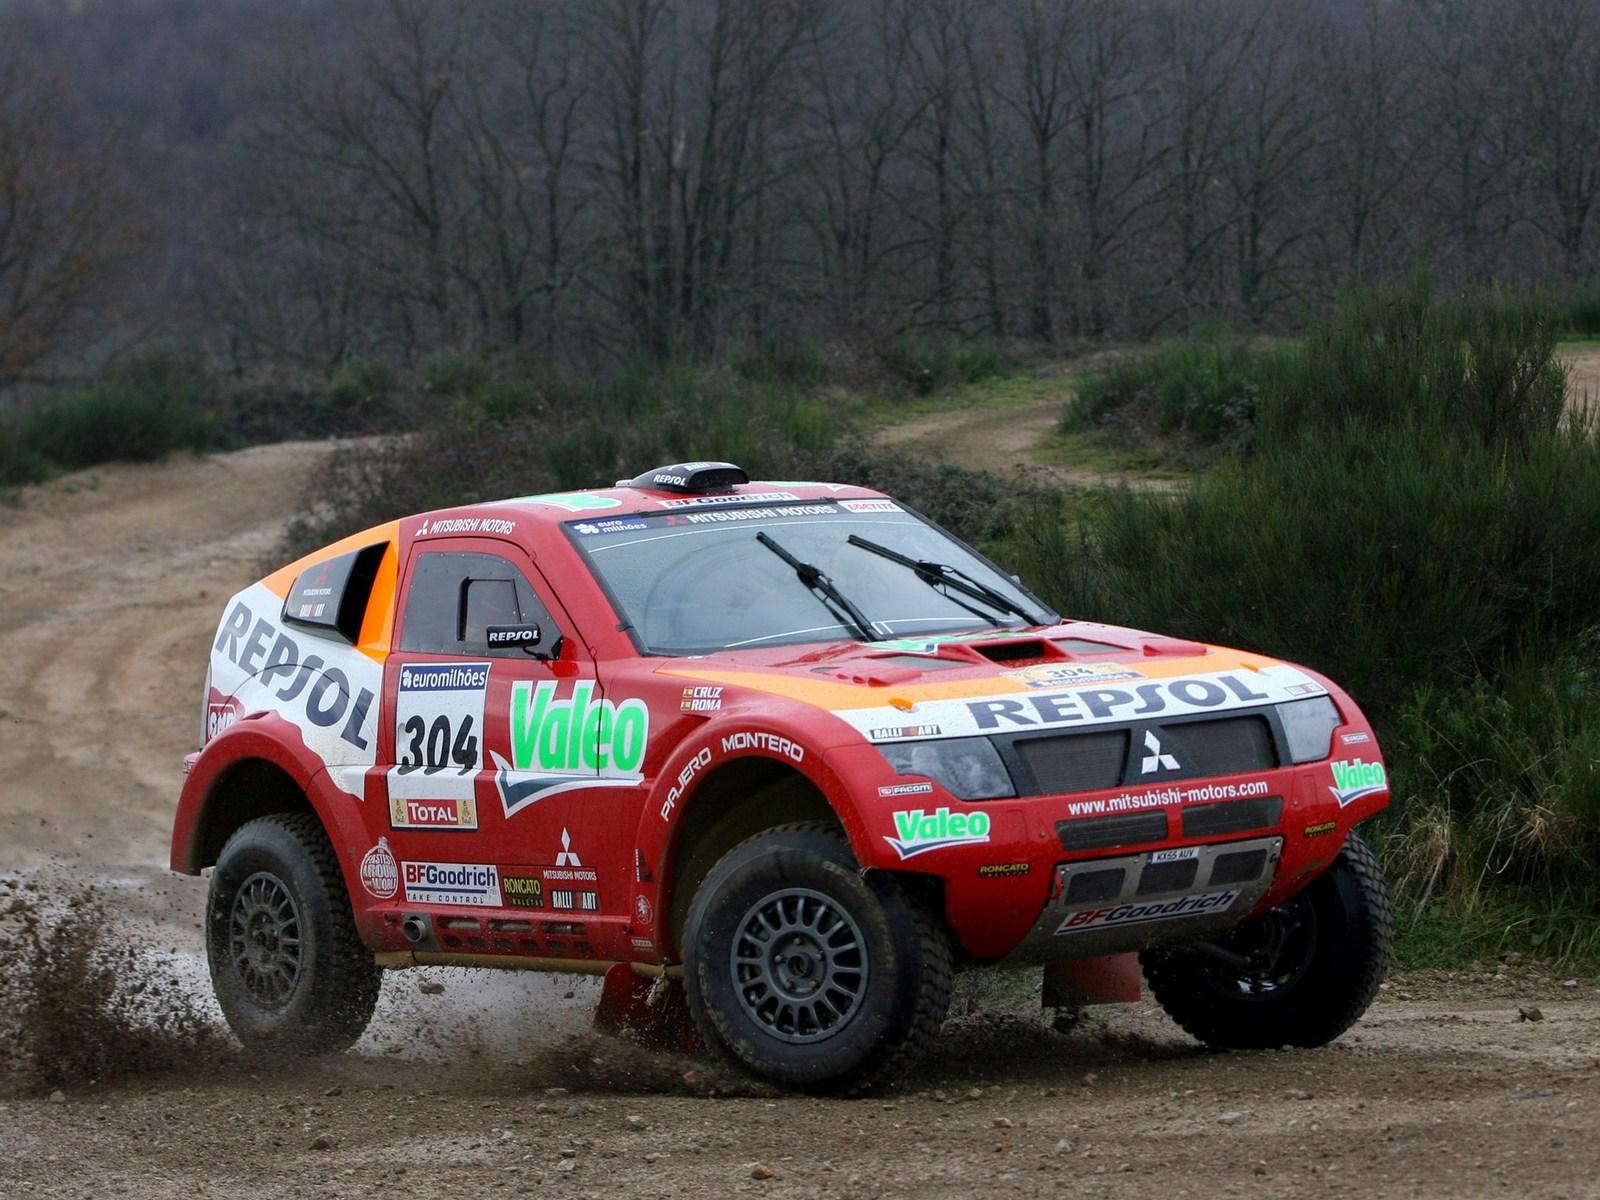 2007 Mitsubishi Pajero Montero Evolution MPR13 Dakar race racing suv offroad g wallpaper ...